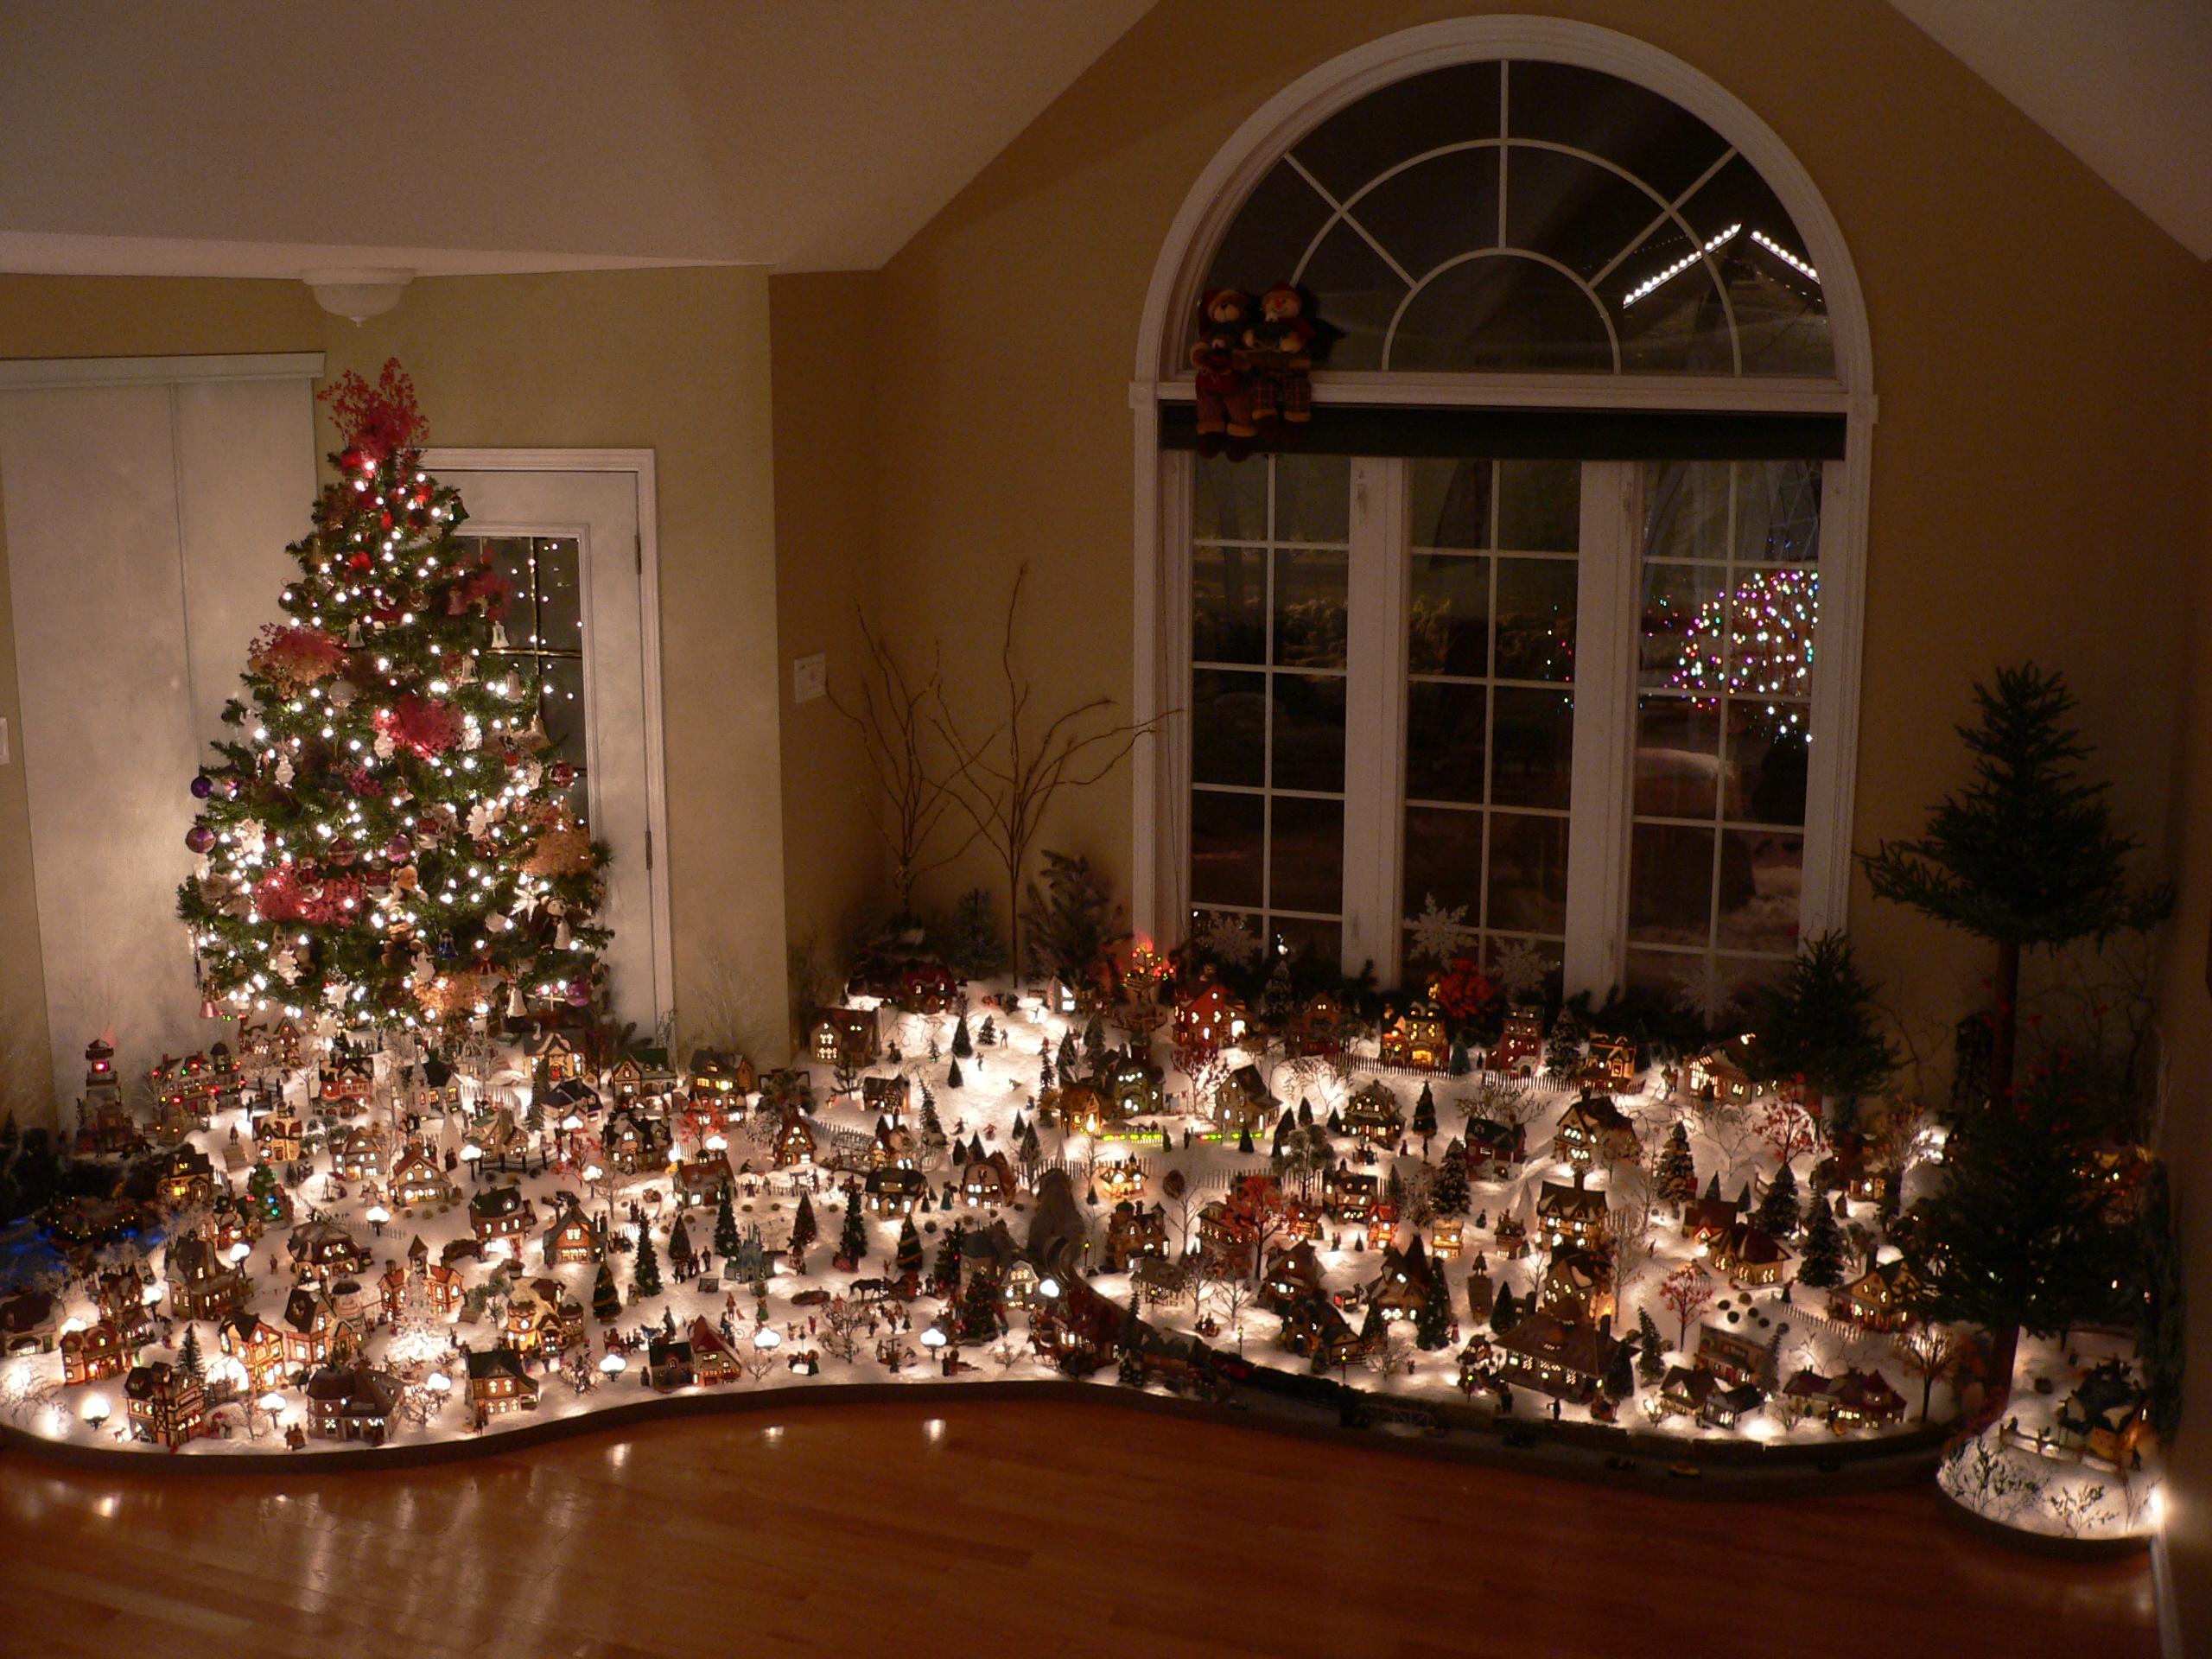 Christmas Village Original By Royfz20